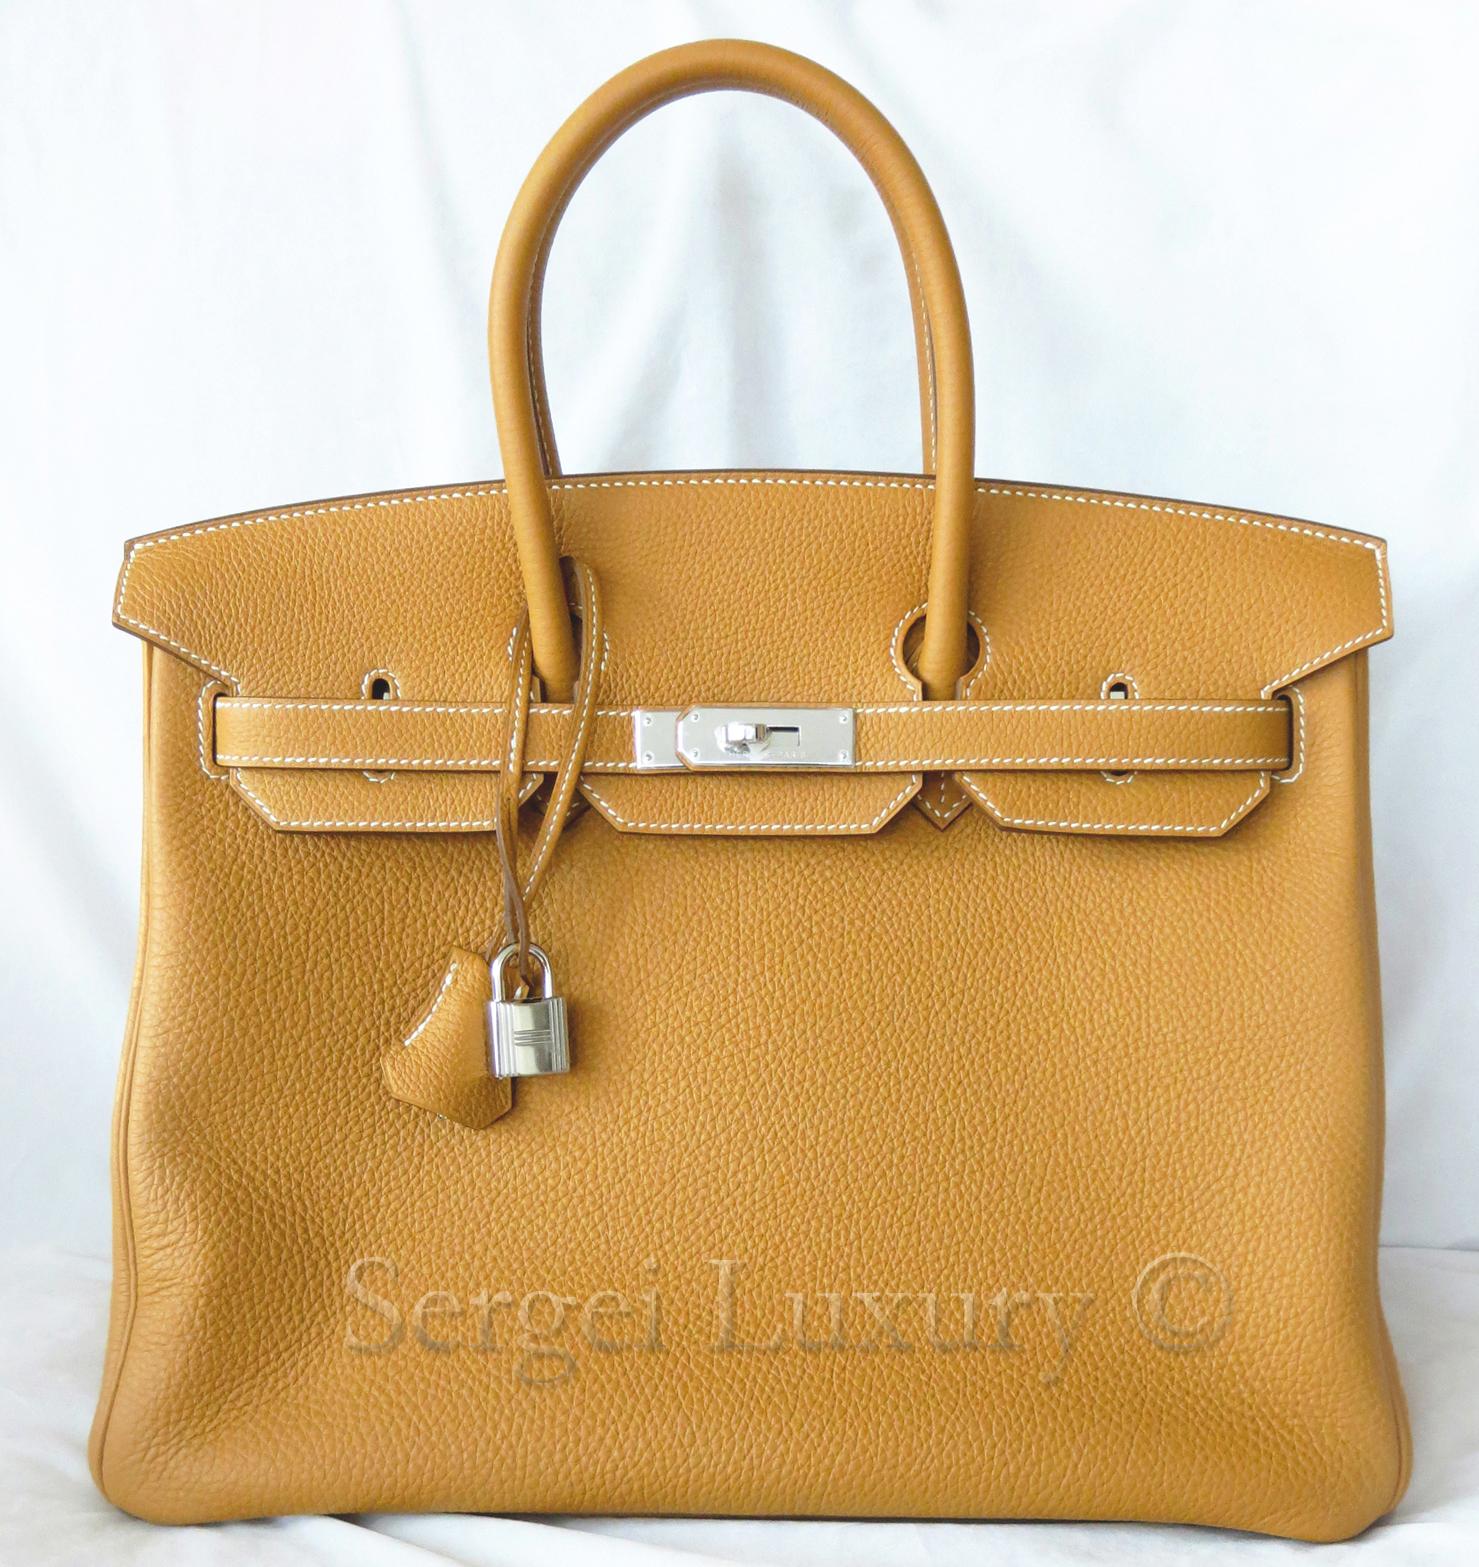 8218b006da NEW Hermes Birkin 35 Sable Sand Gold Togo Tote bag PHW Silver — Sergei  Luxury